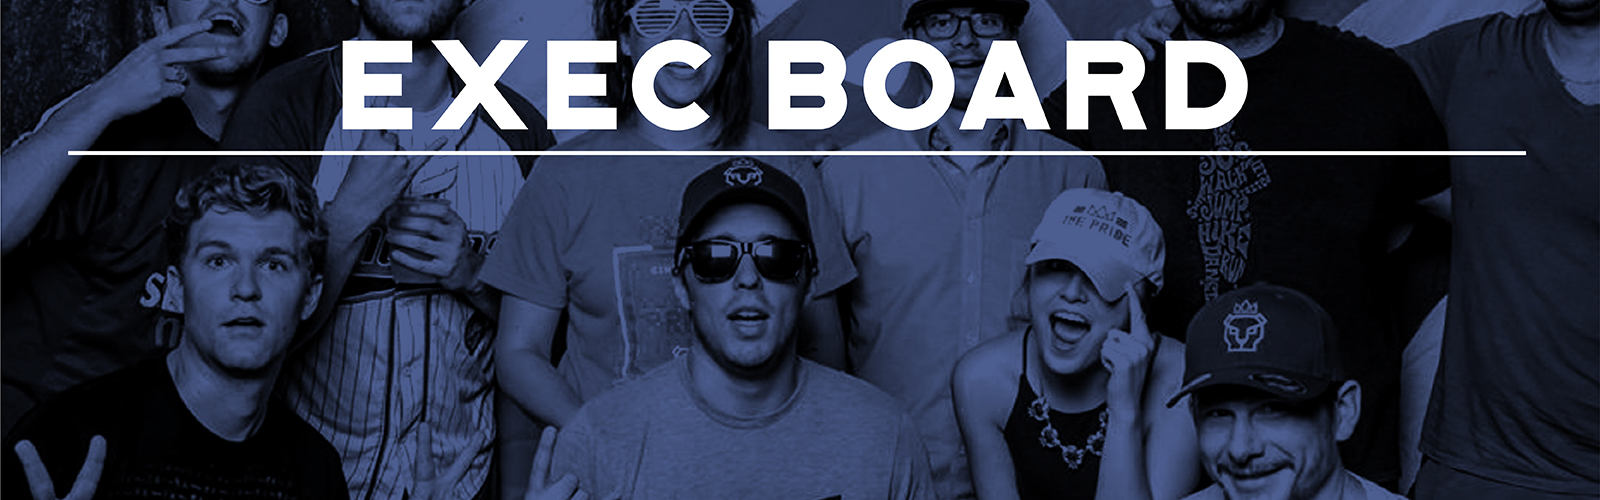 Exec Board Banner.jpg